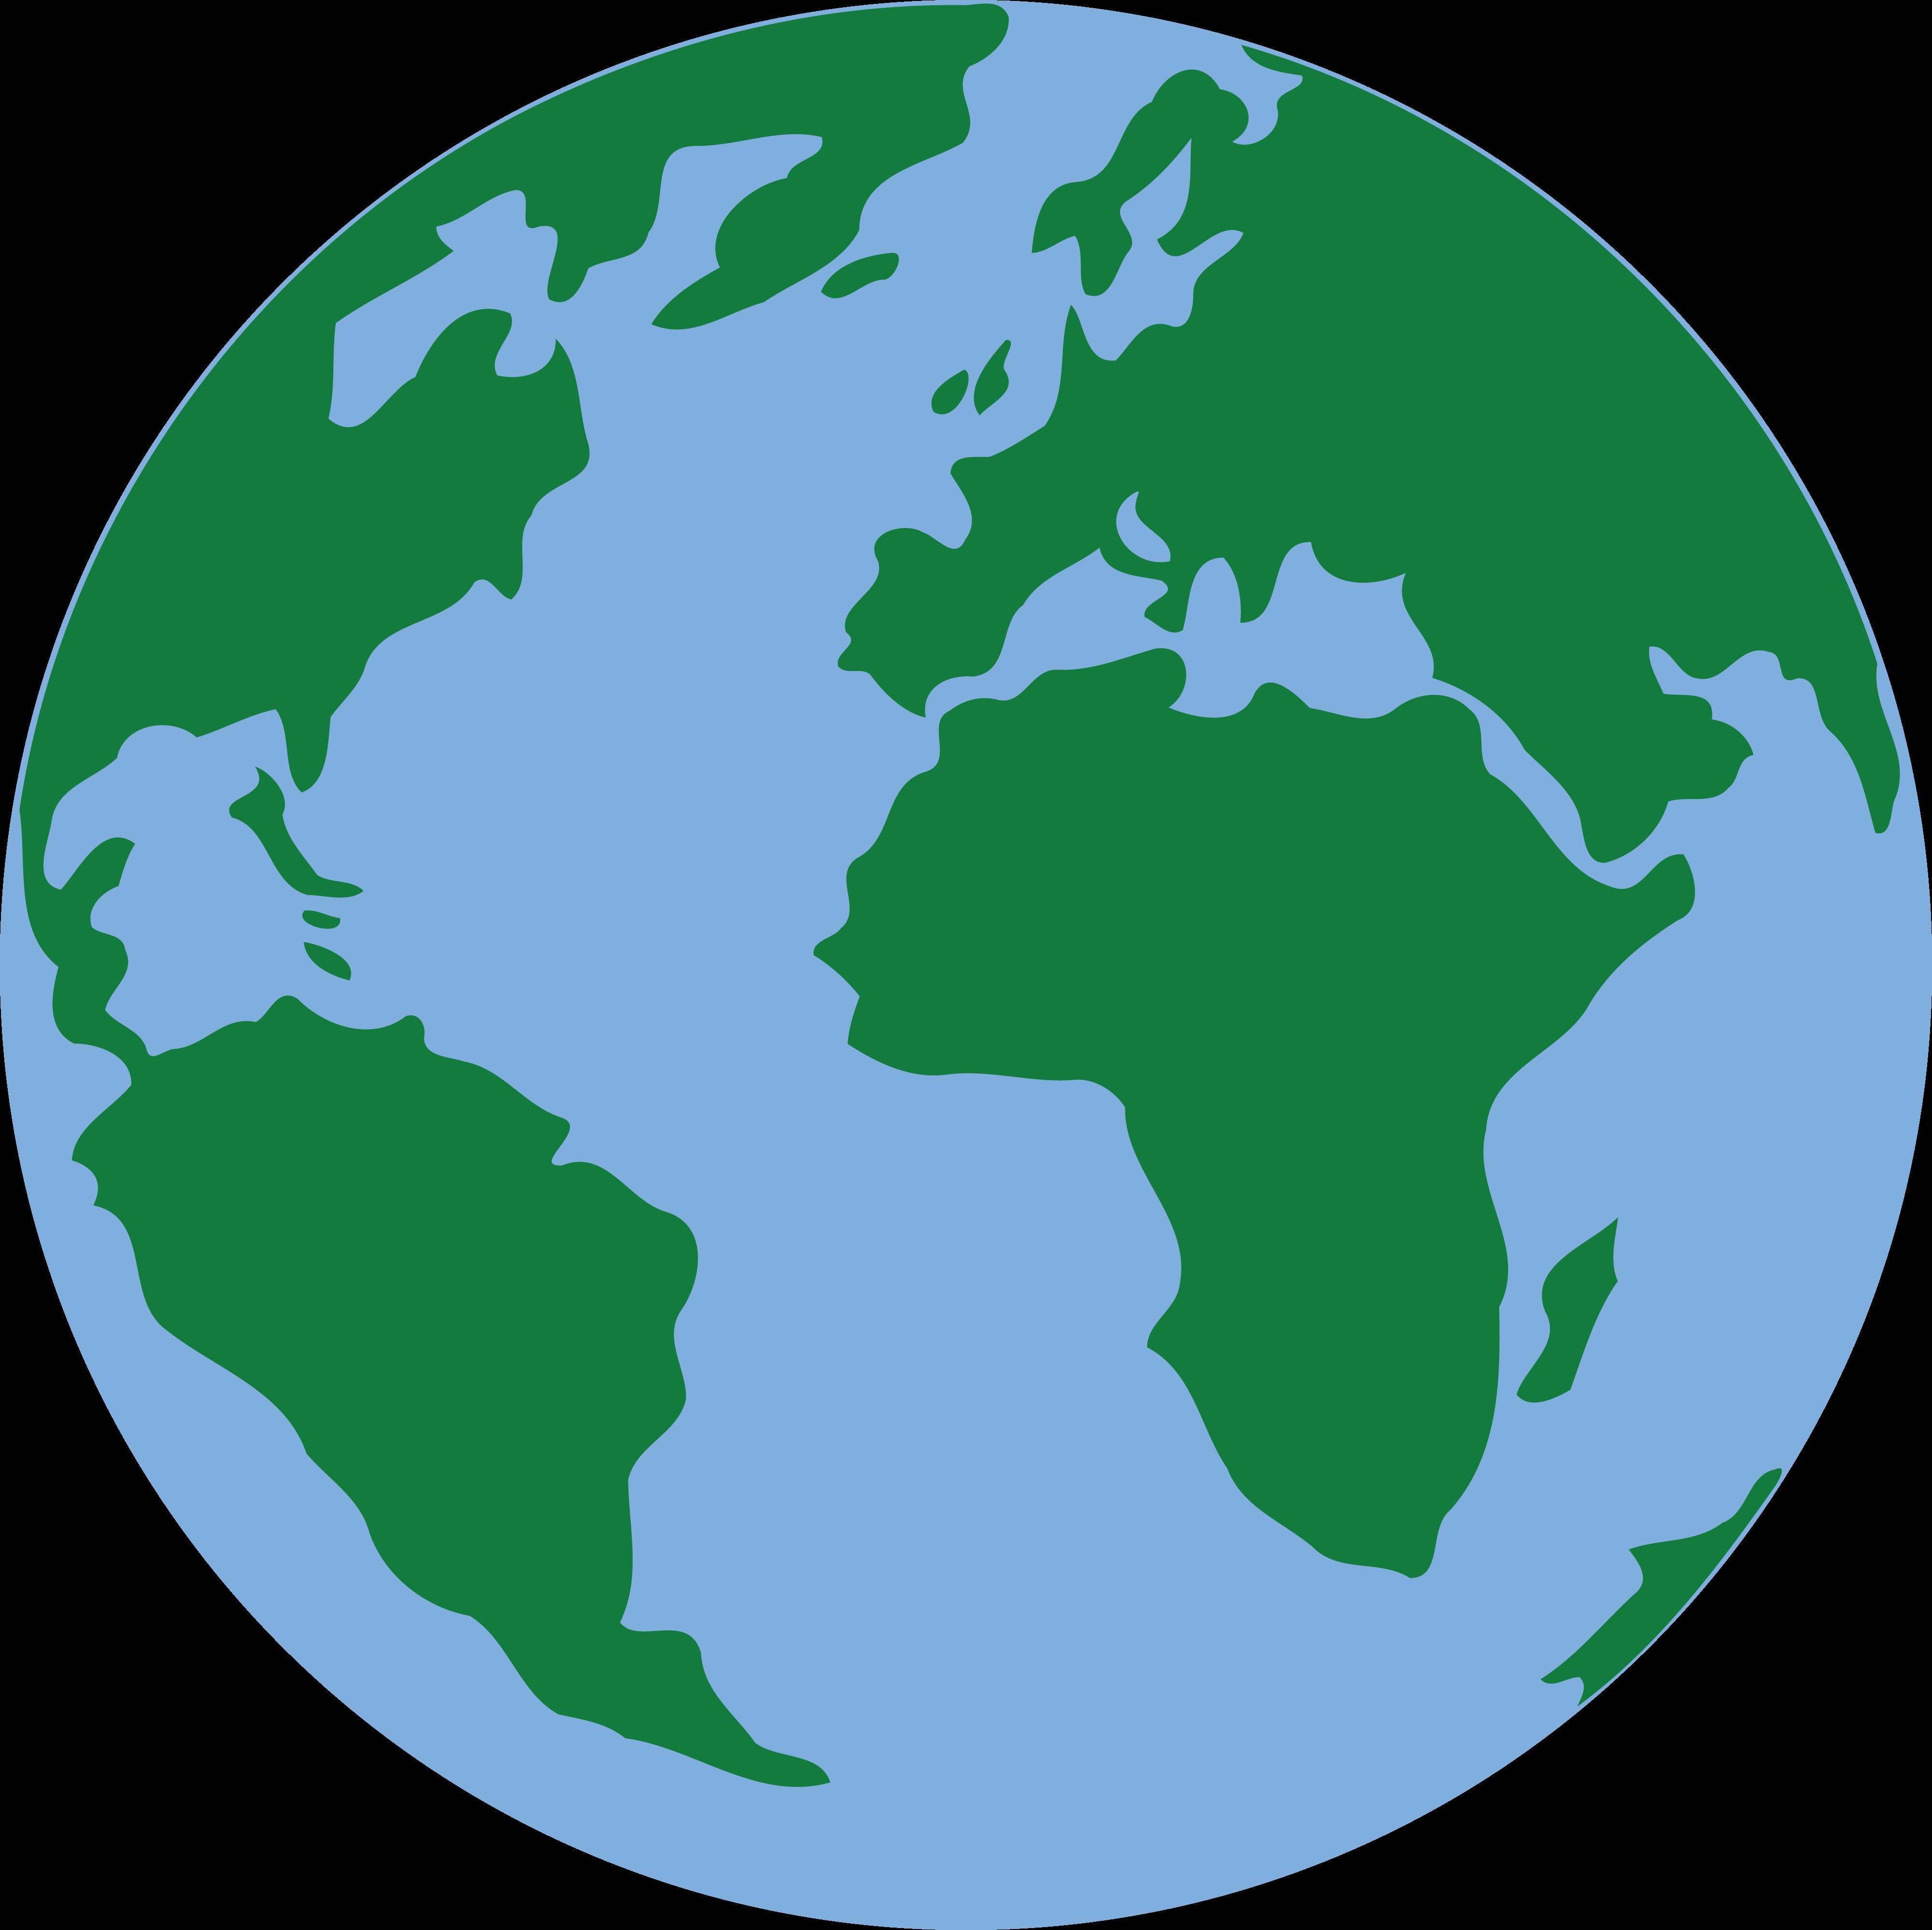 Globe Earth Clip art.